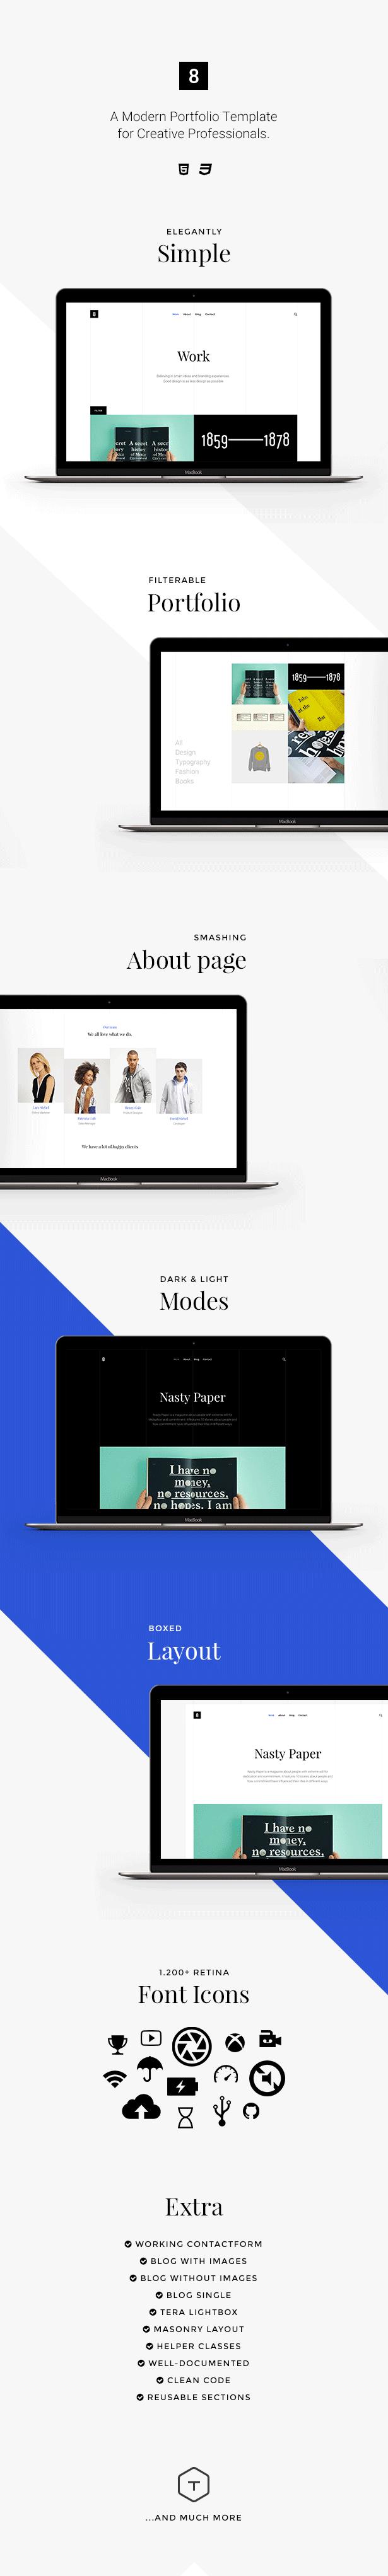 Eight | Responsive Portfolio HTML5 Template for designers, photographers, freelancers or businesses